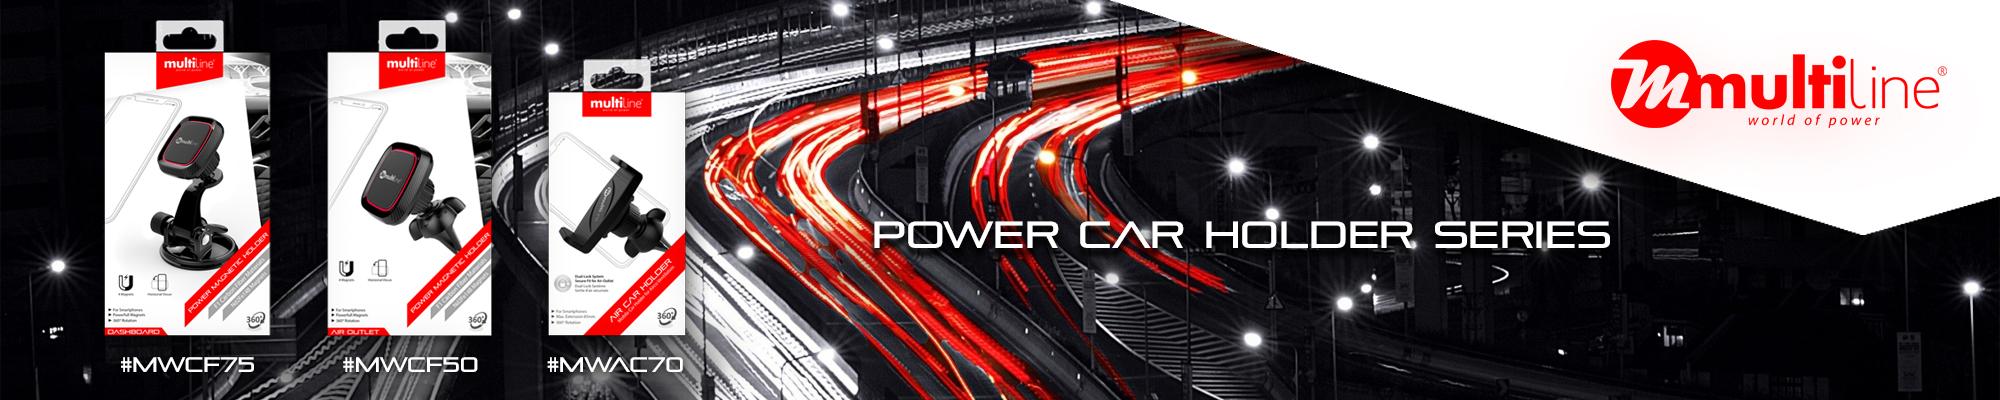 New Multiline Car Accessoires available via GSM Parts Center. Power car Holder Series.